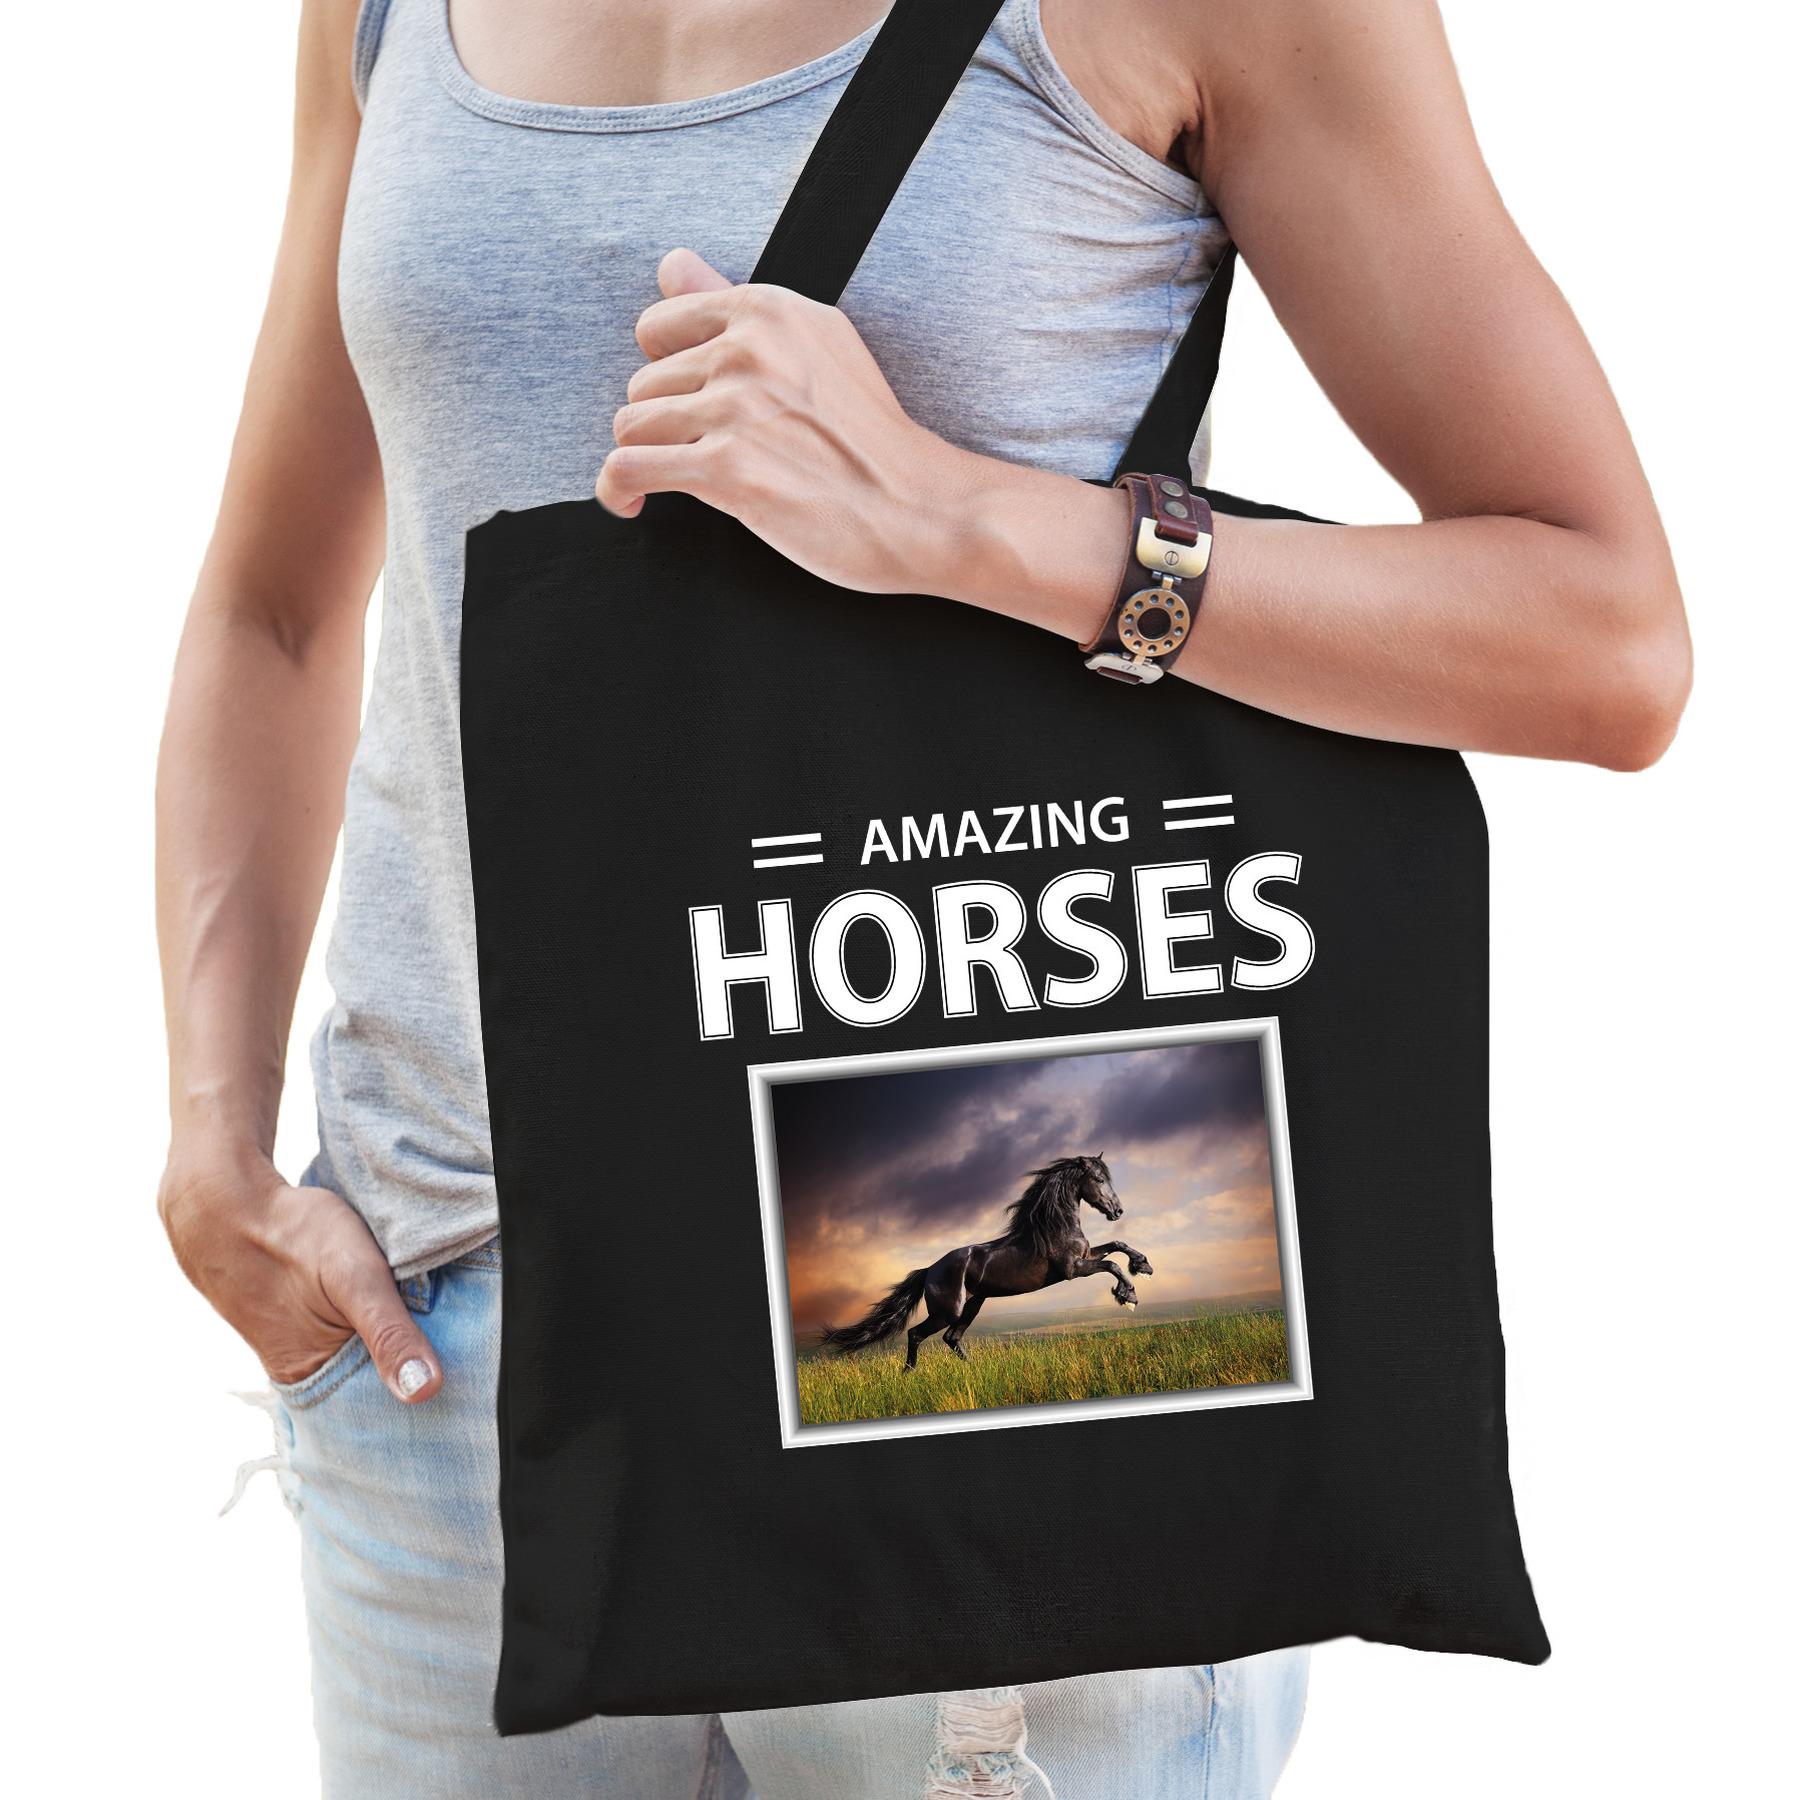 Katoenen tasje Zwarte paarden zwart - amazing horses Zwart paard cadeau tas